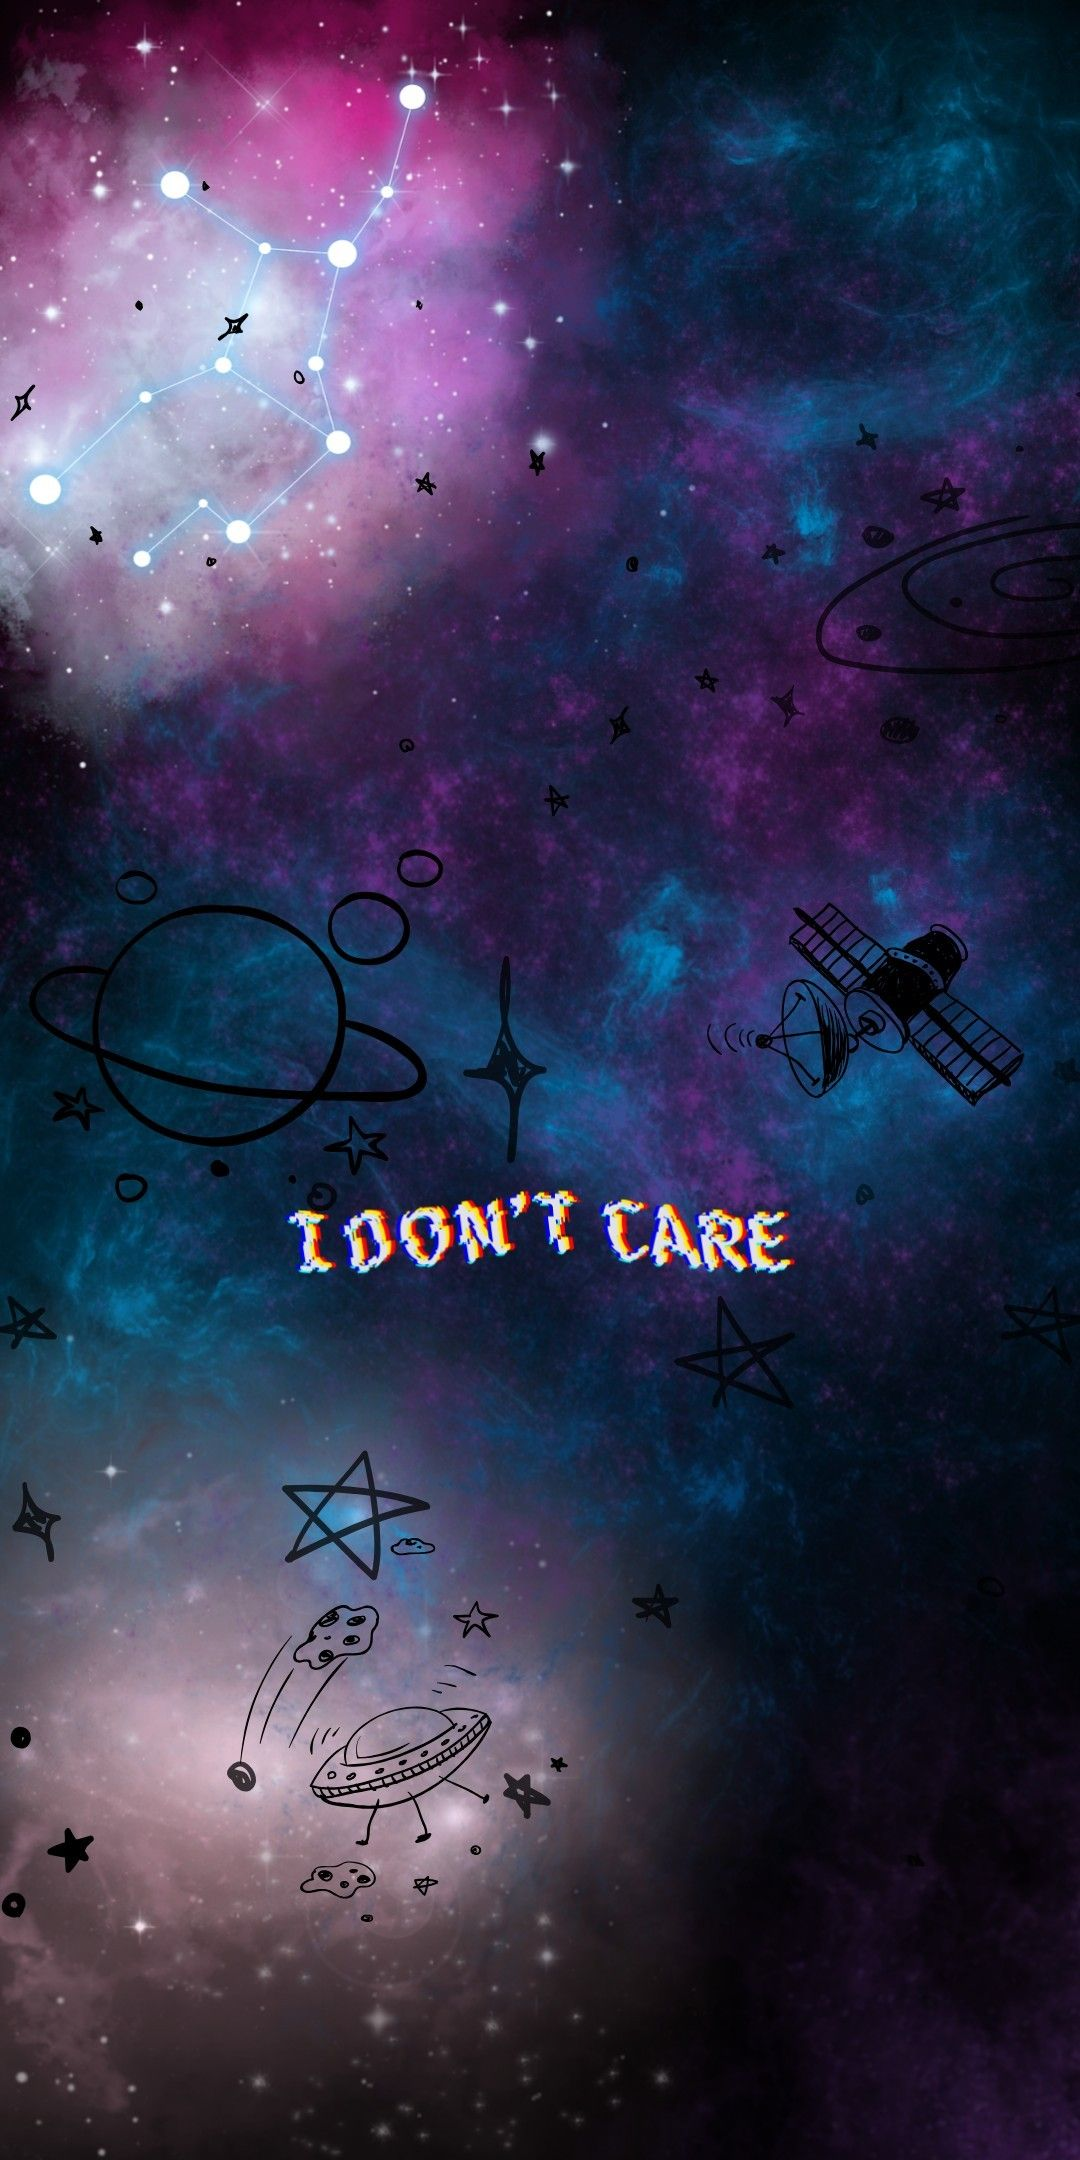 I Don T Care Gambar Luar Angkasa Lukisan Galaksi Pemandangan Abstrak